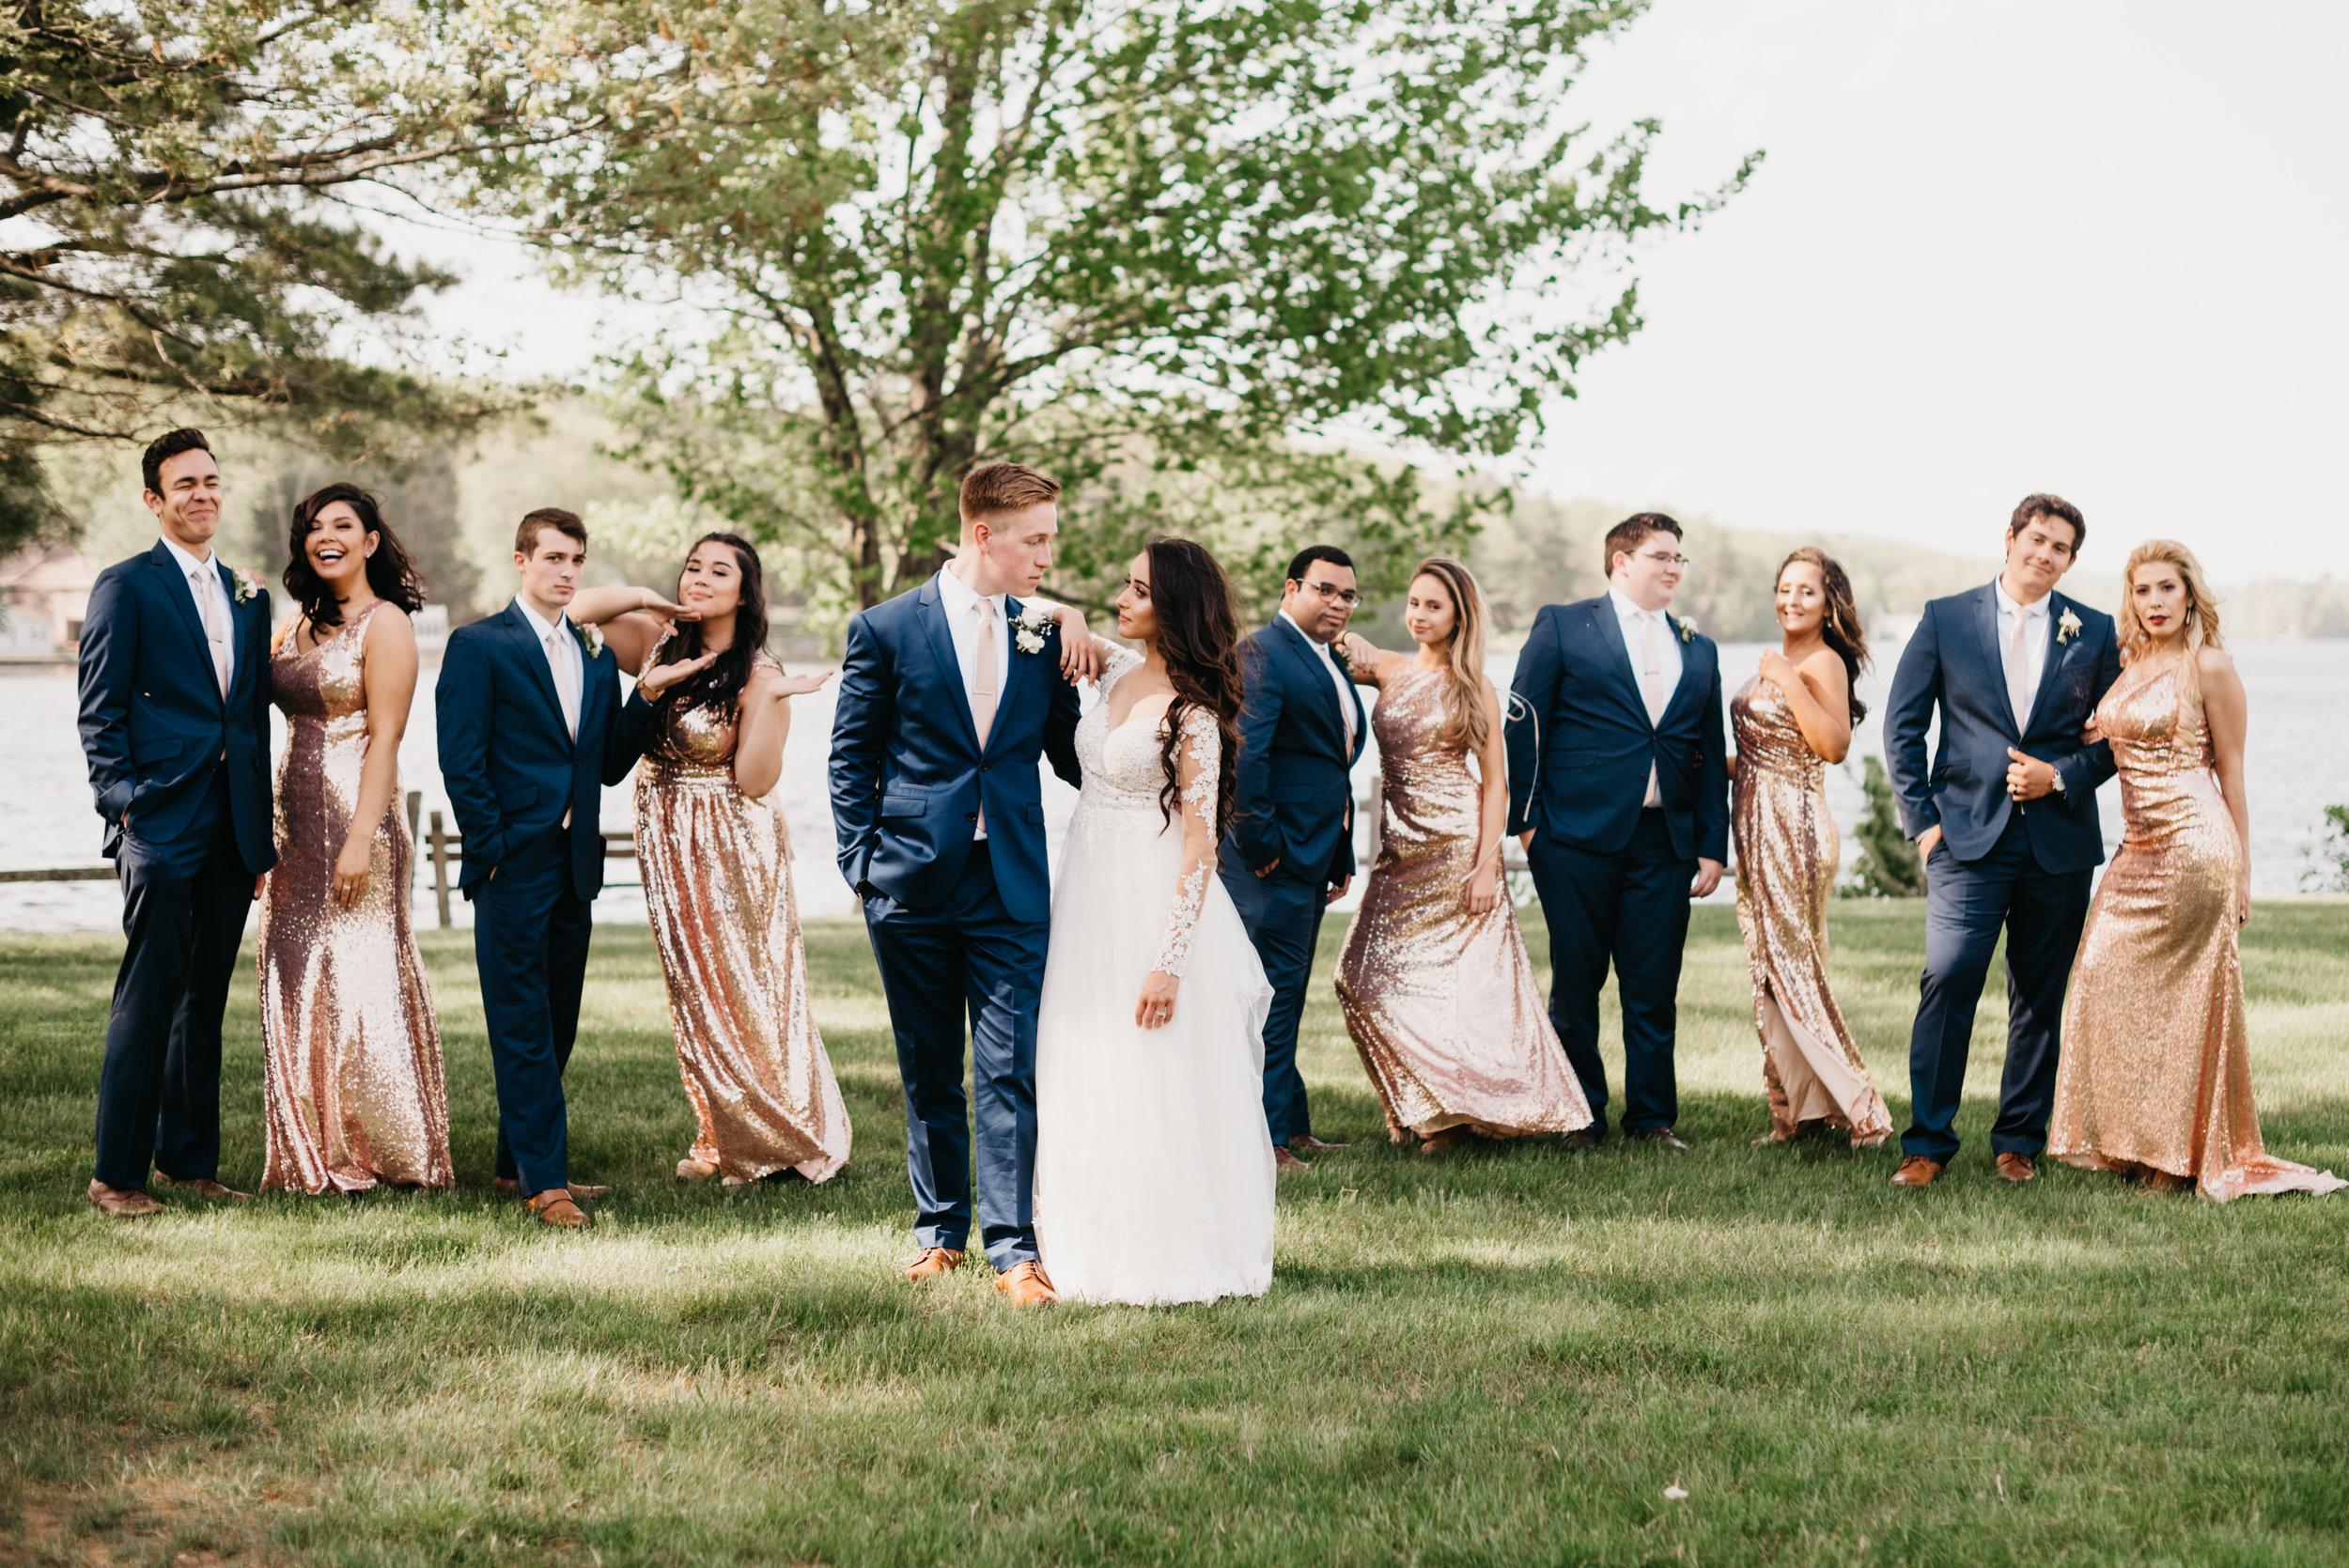 Barch-Massachusetts-Lakeside Tent Wedding-Western Massachusetts Wedding Photographer-01407.jpg